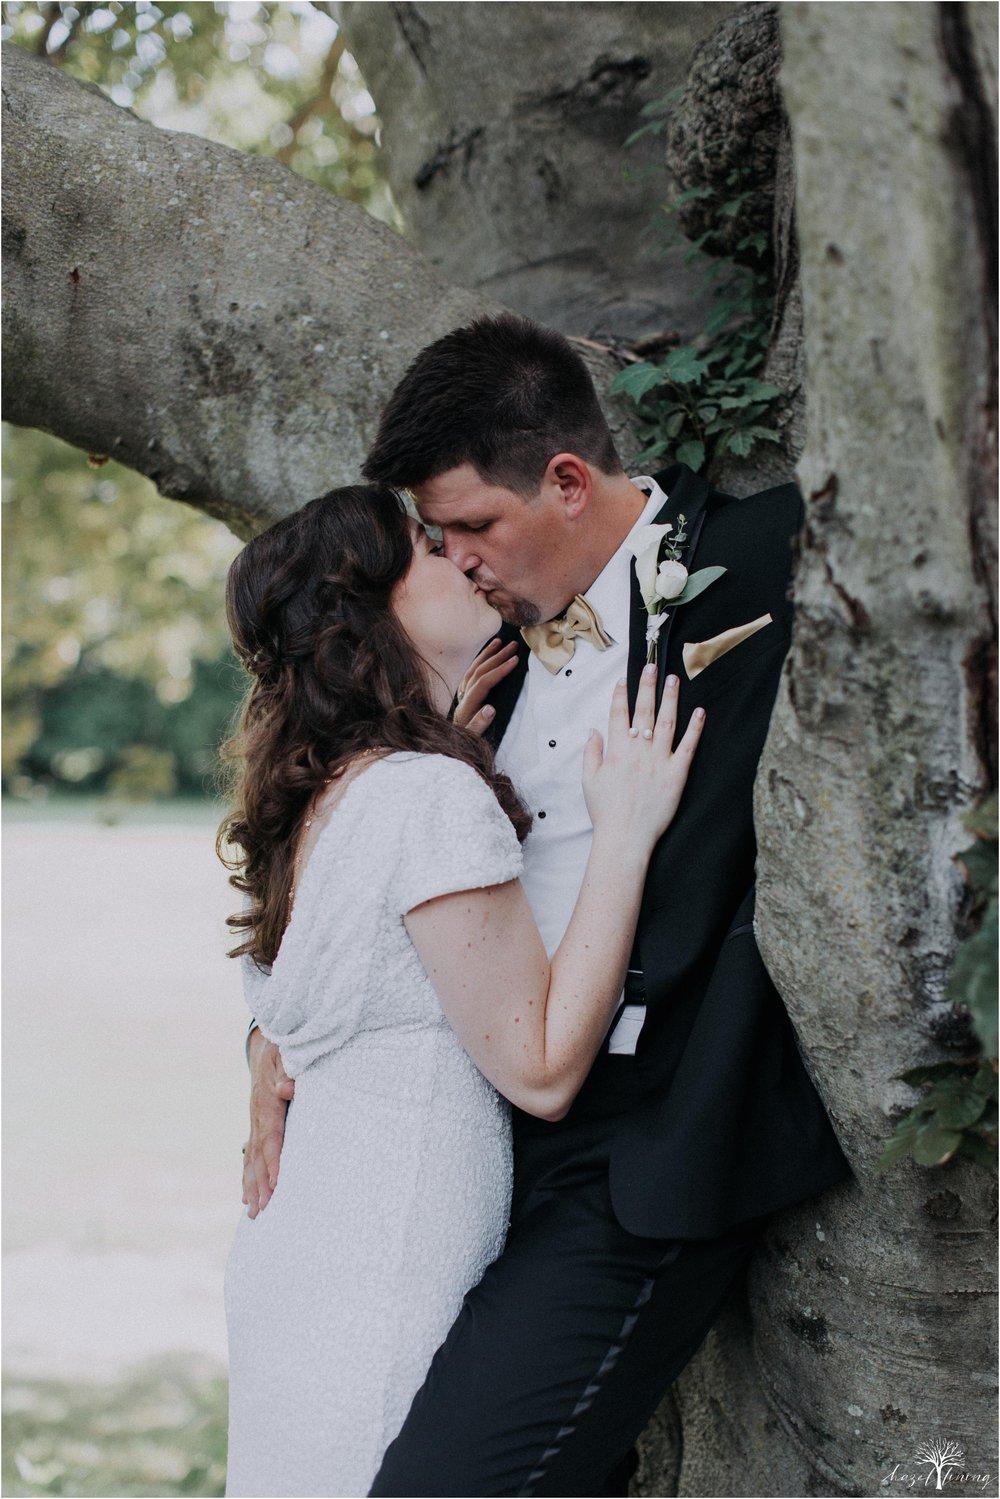 elizabeth-doelp-andrew-foreback-middletown-country-club-summer-langhorne-pennsylvania-wedding-hazel-lining-travel-wedding-elopement-photography_0092.jpg